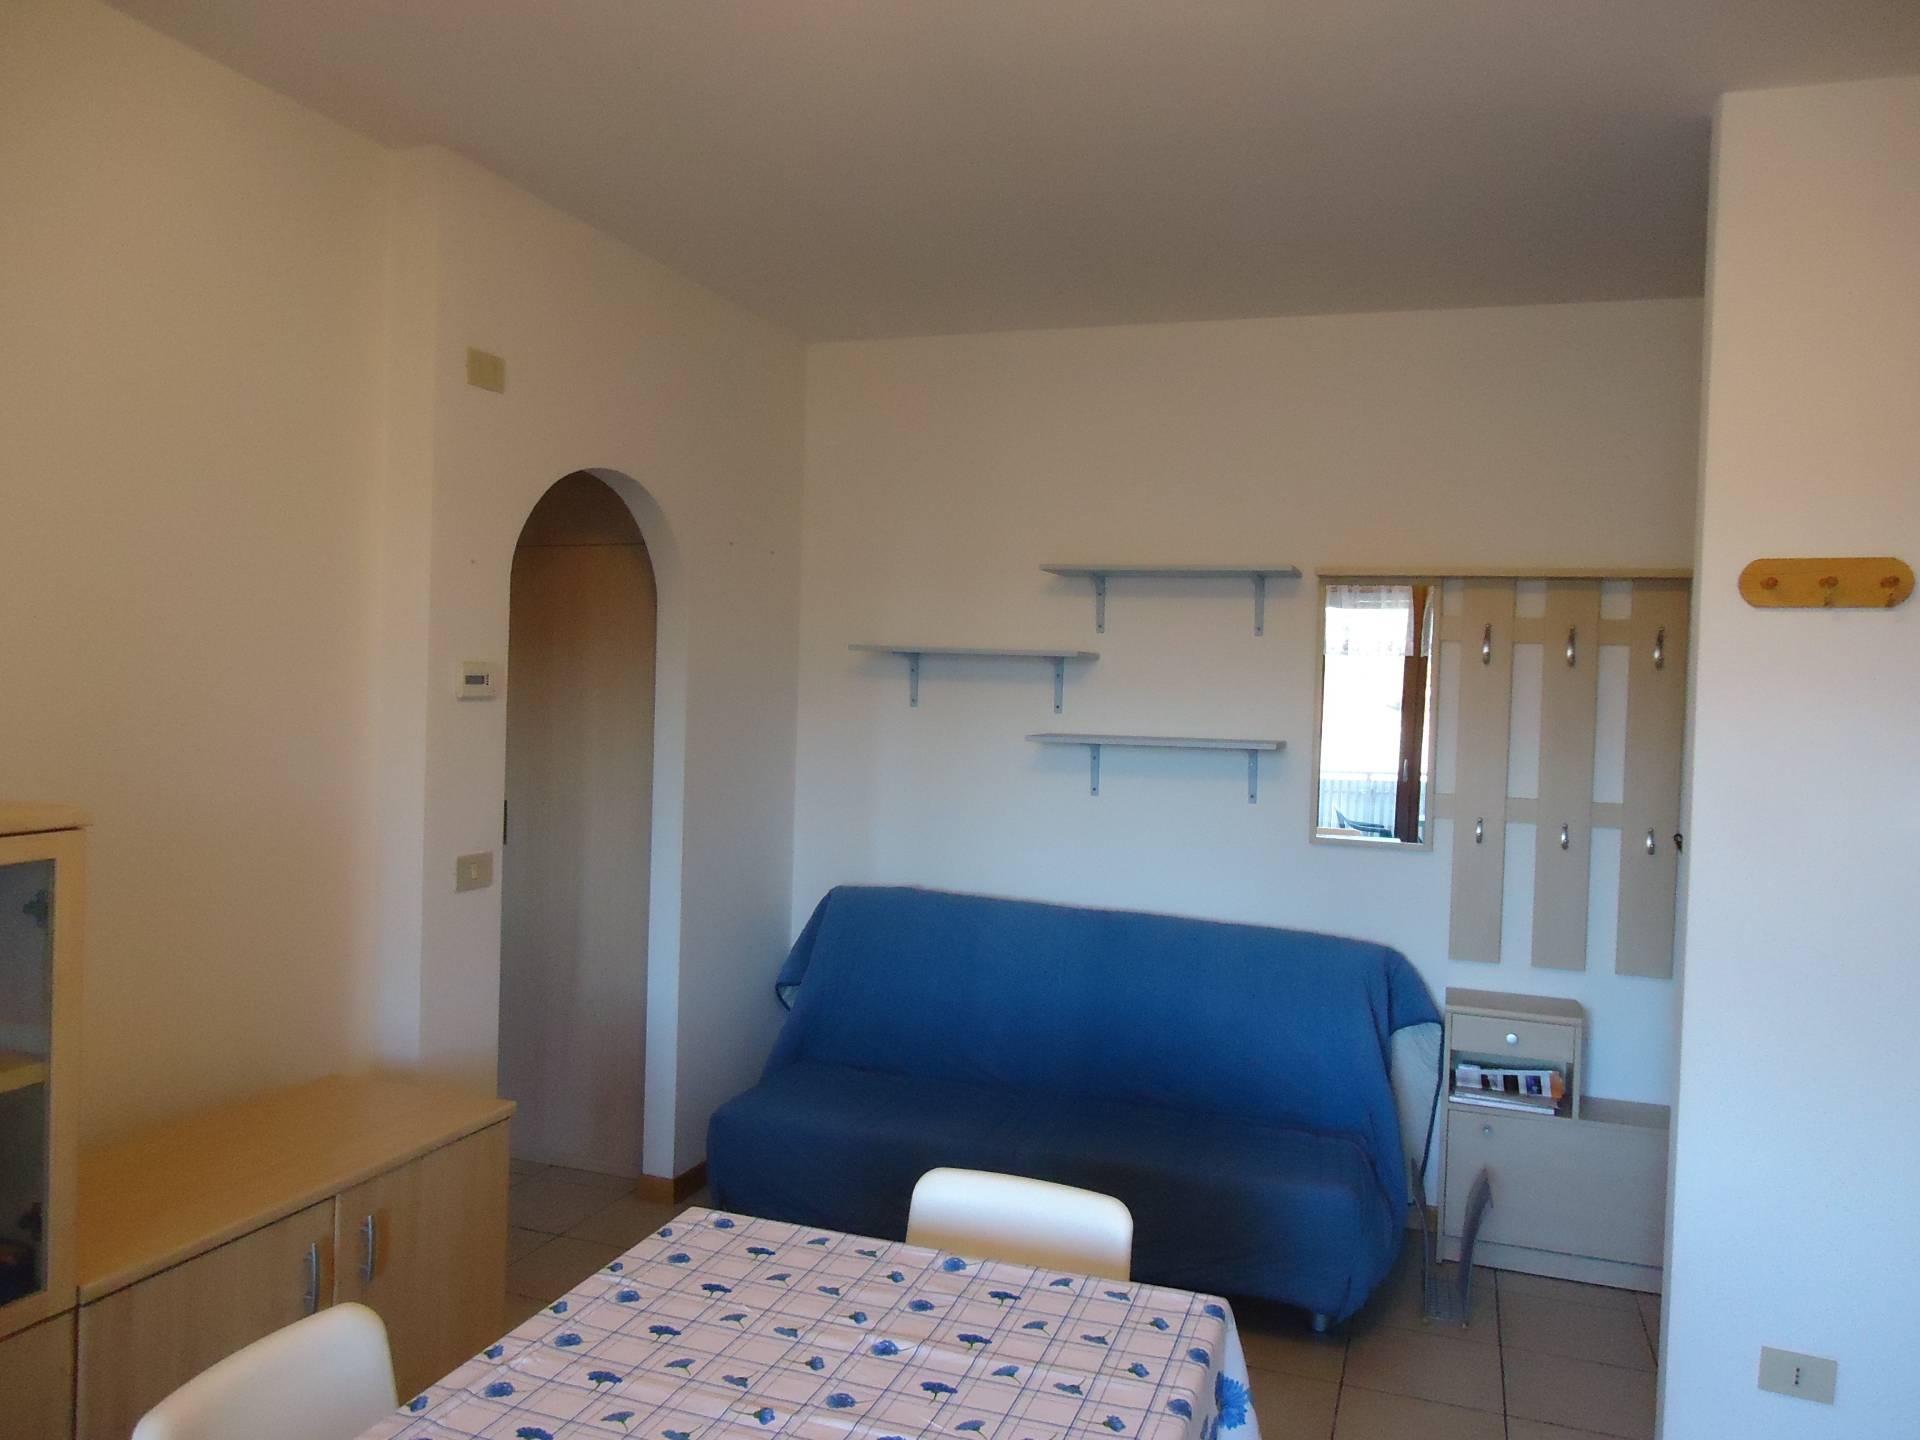 Bilocale Udine Via Pozzuolo 4